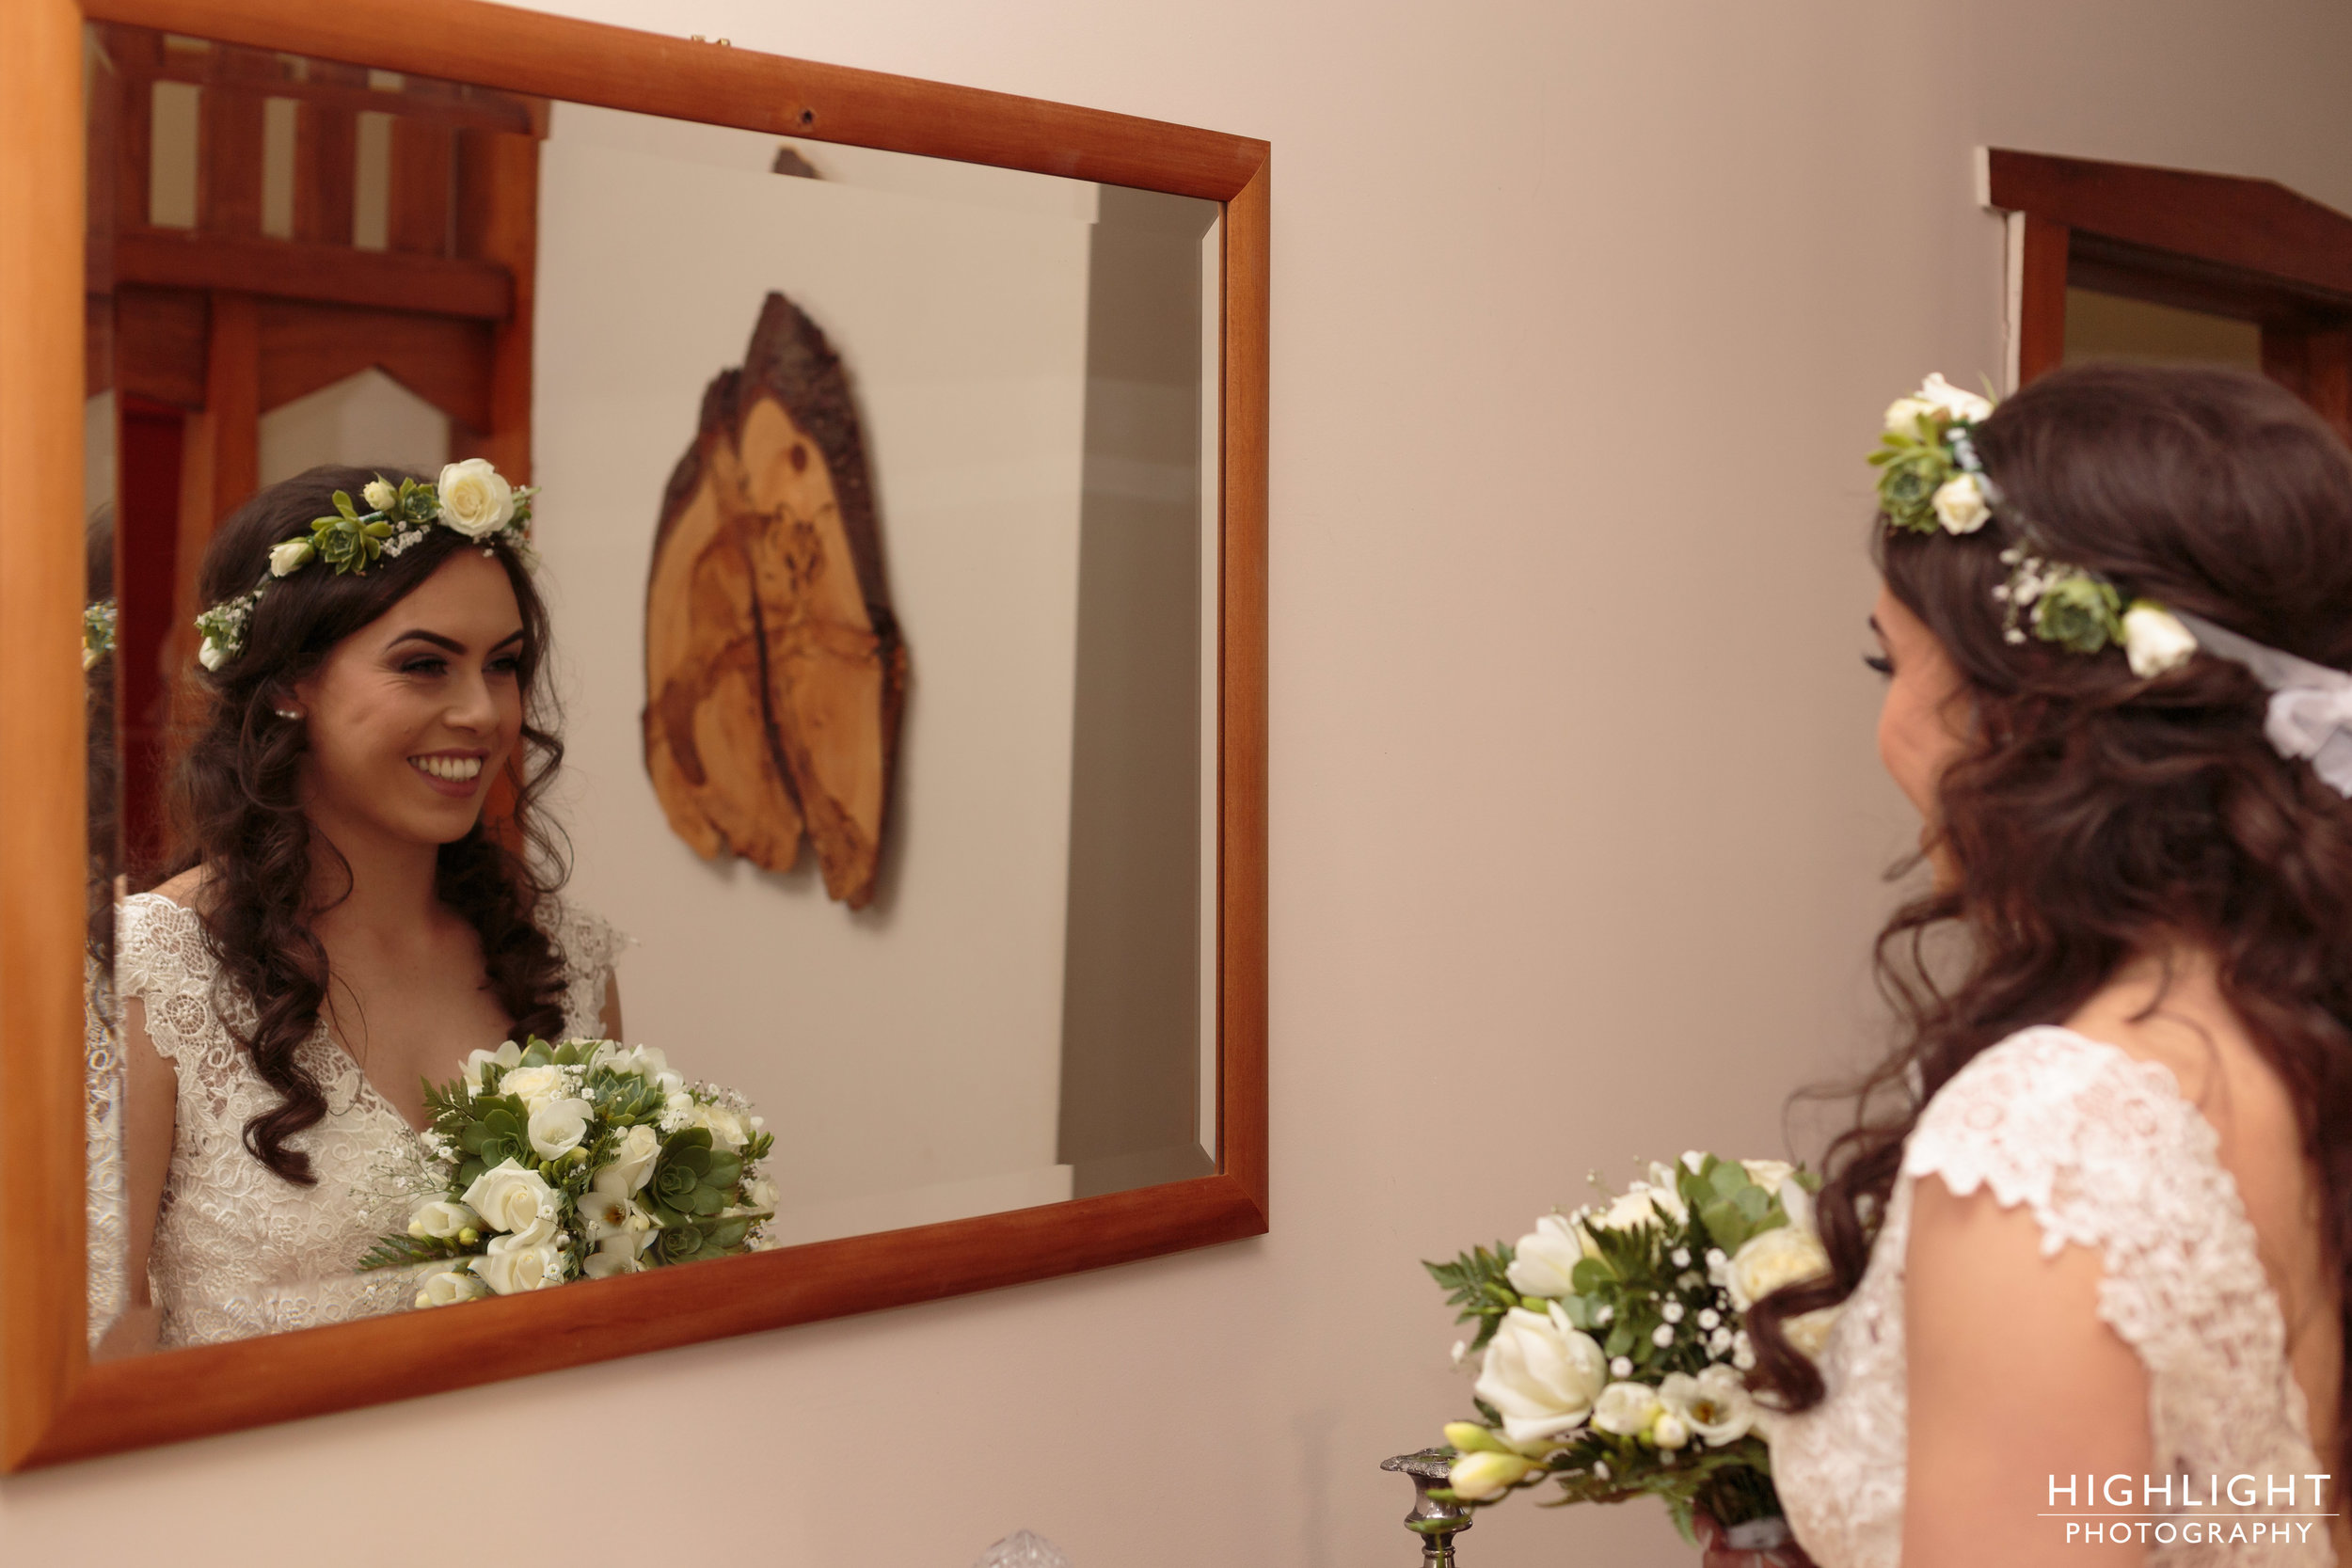 highlight_wedding_photography_makoura_lodge_manawatu_new_zealand-49.jpg